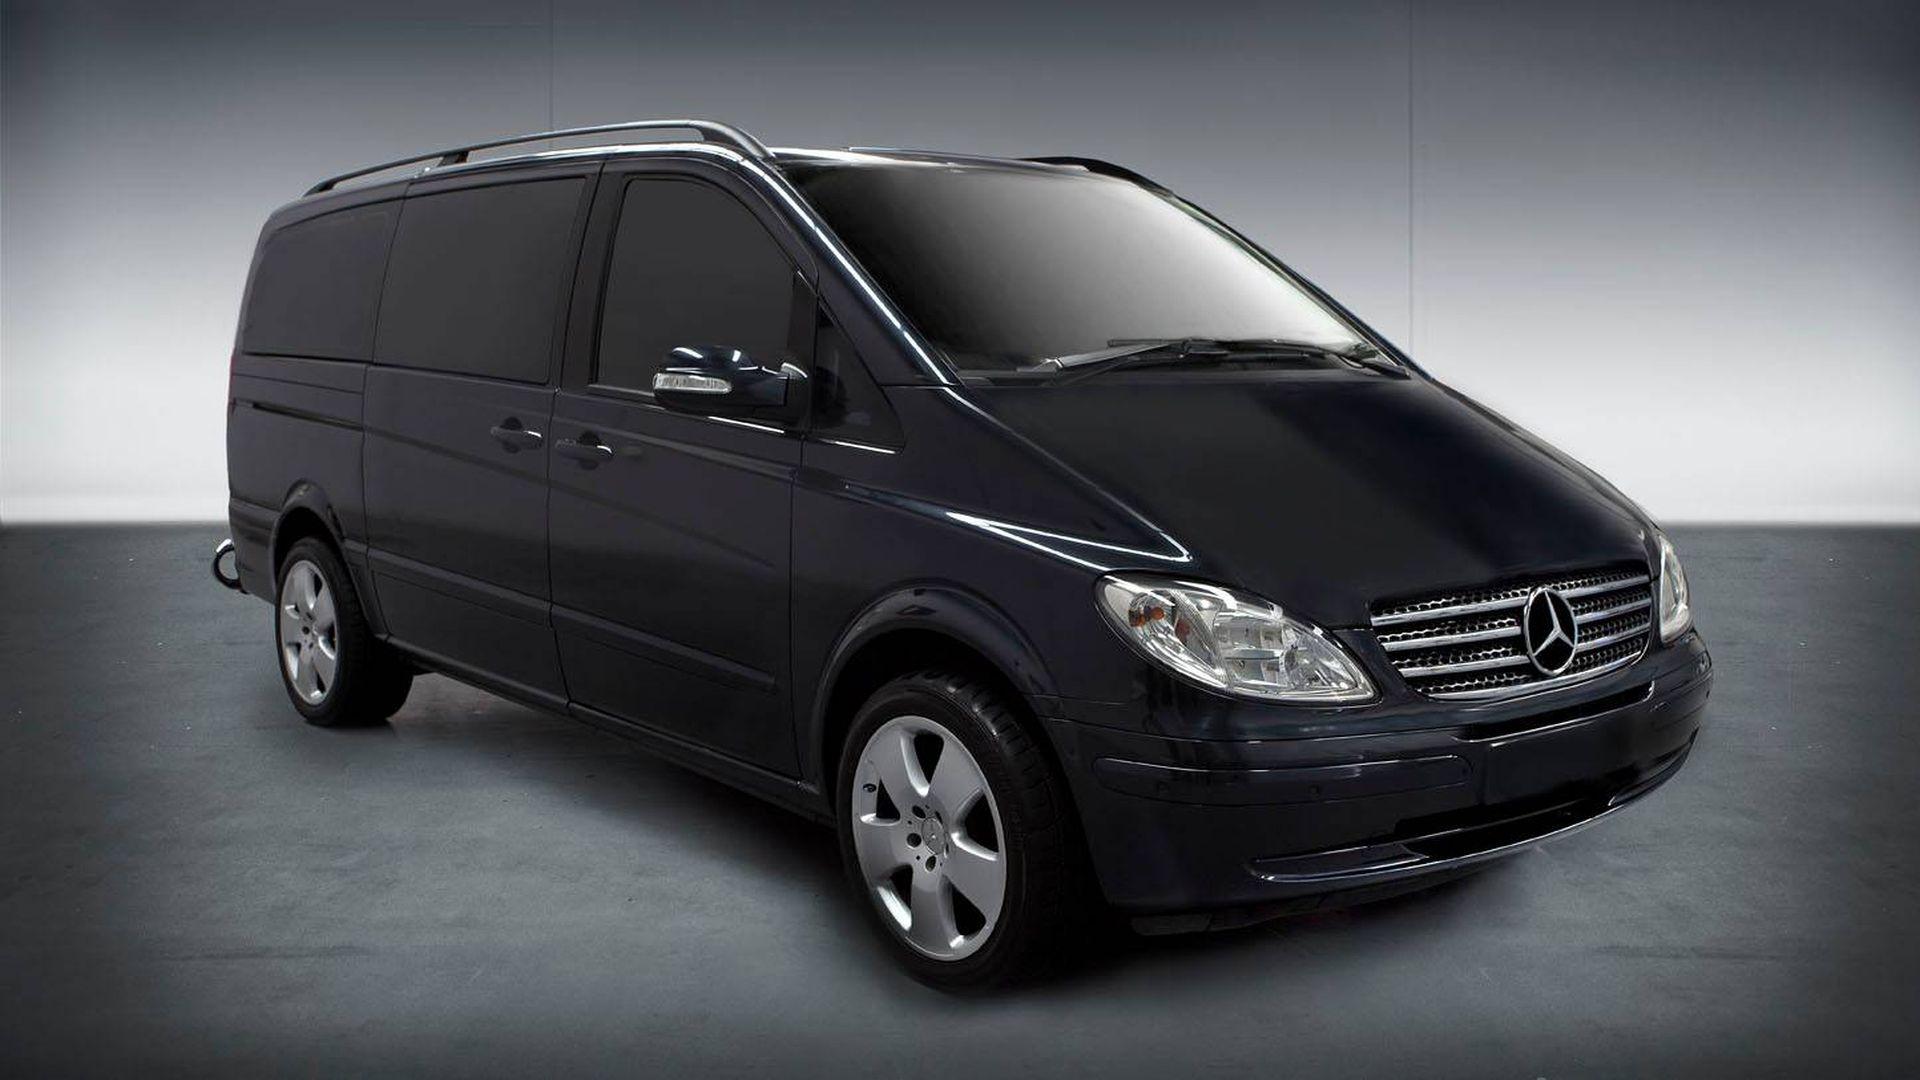 7 Seater Mercedes Viano